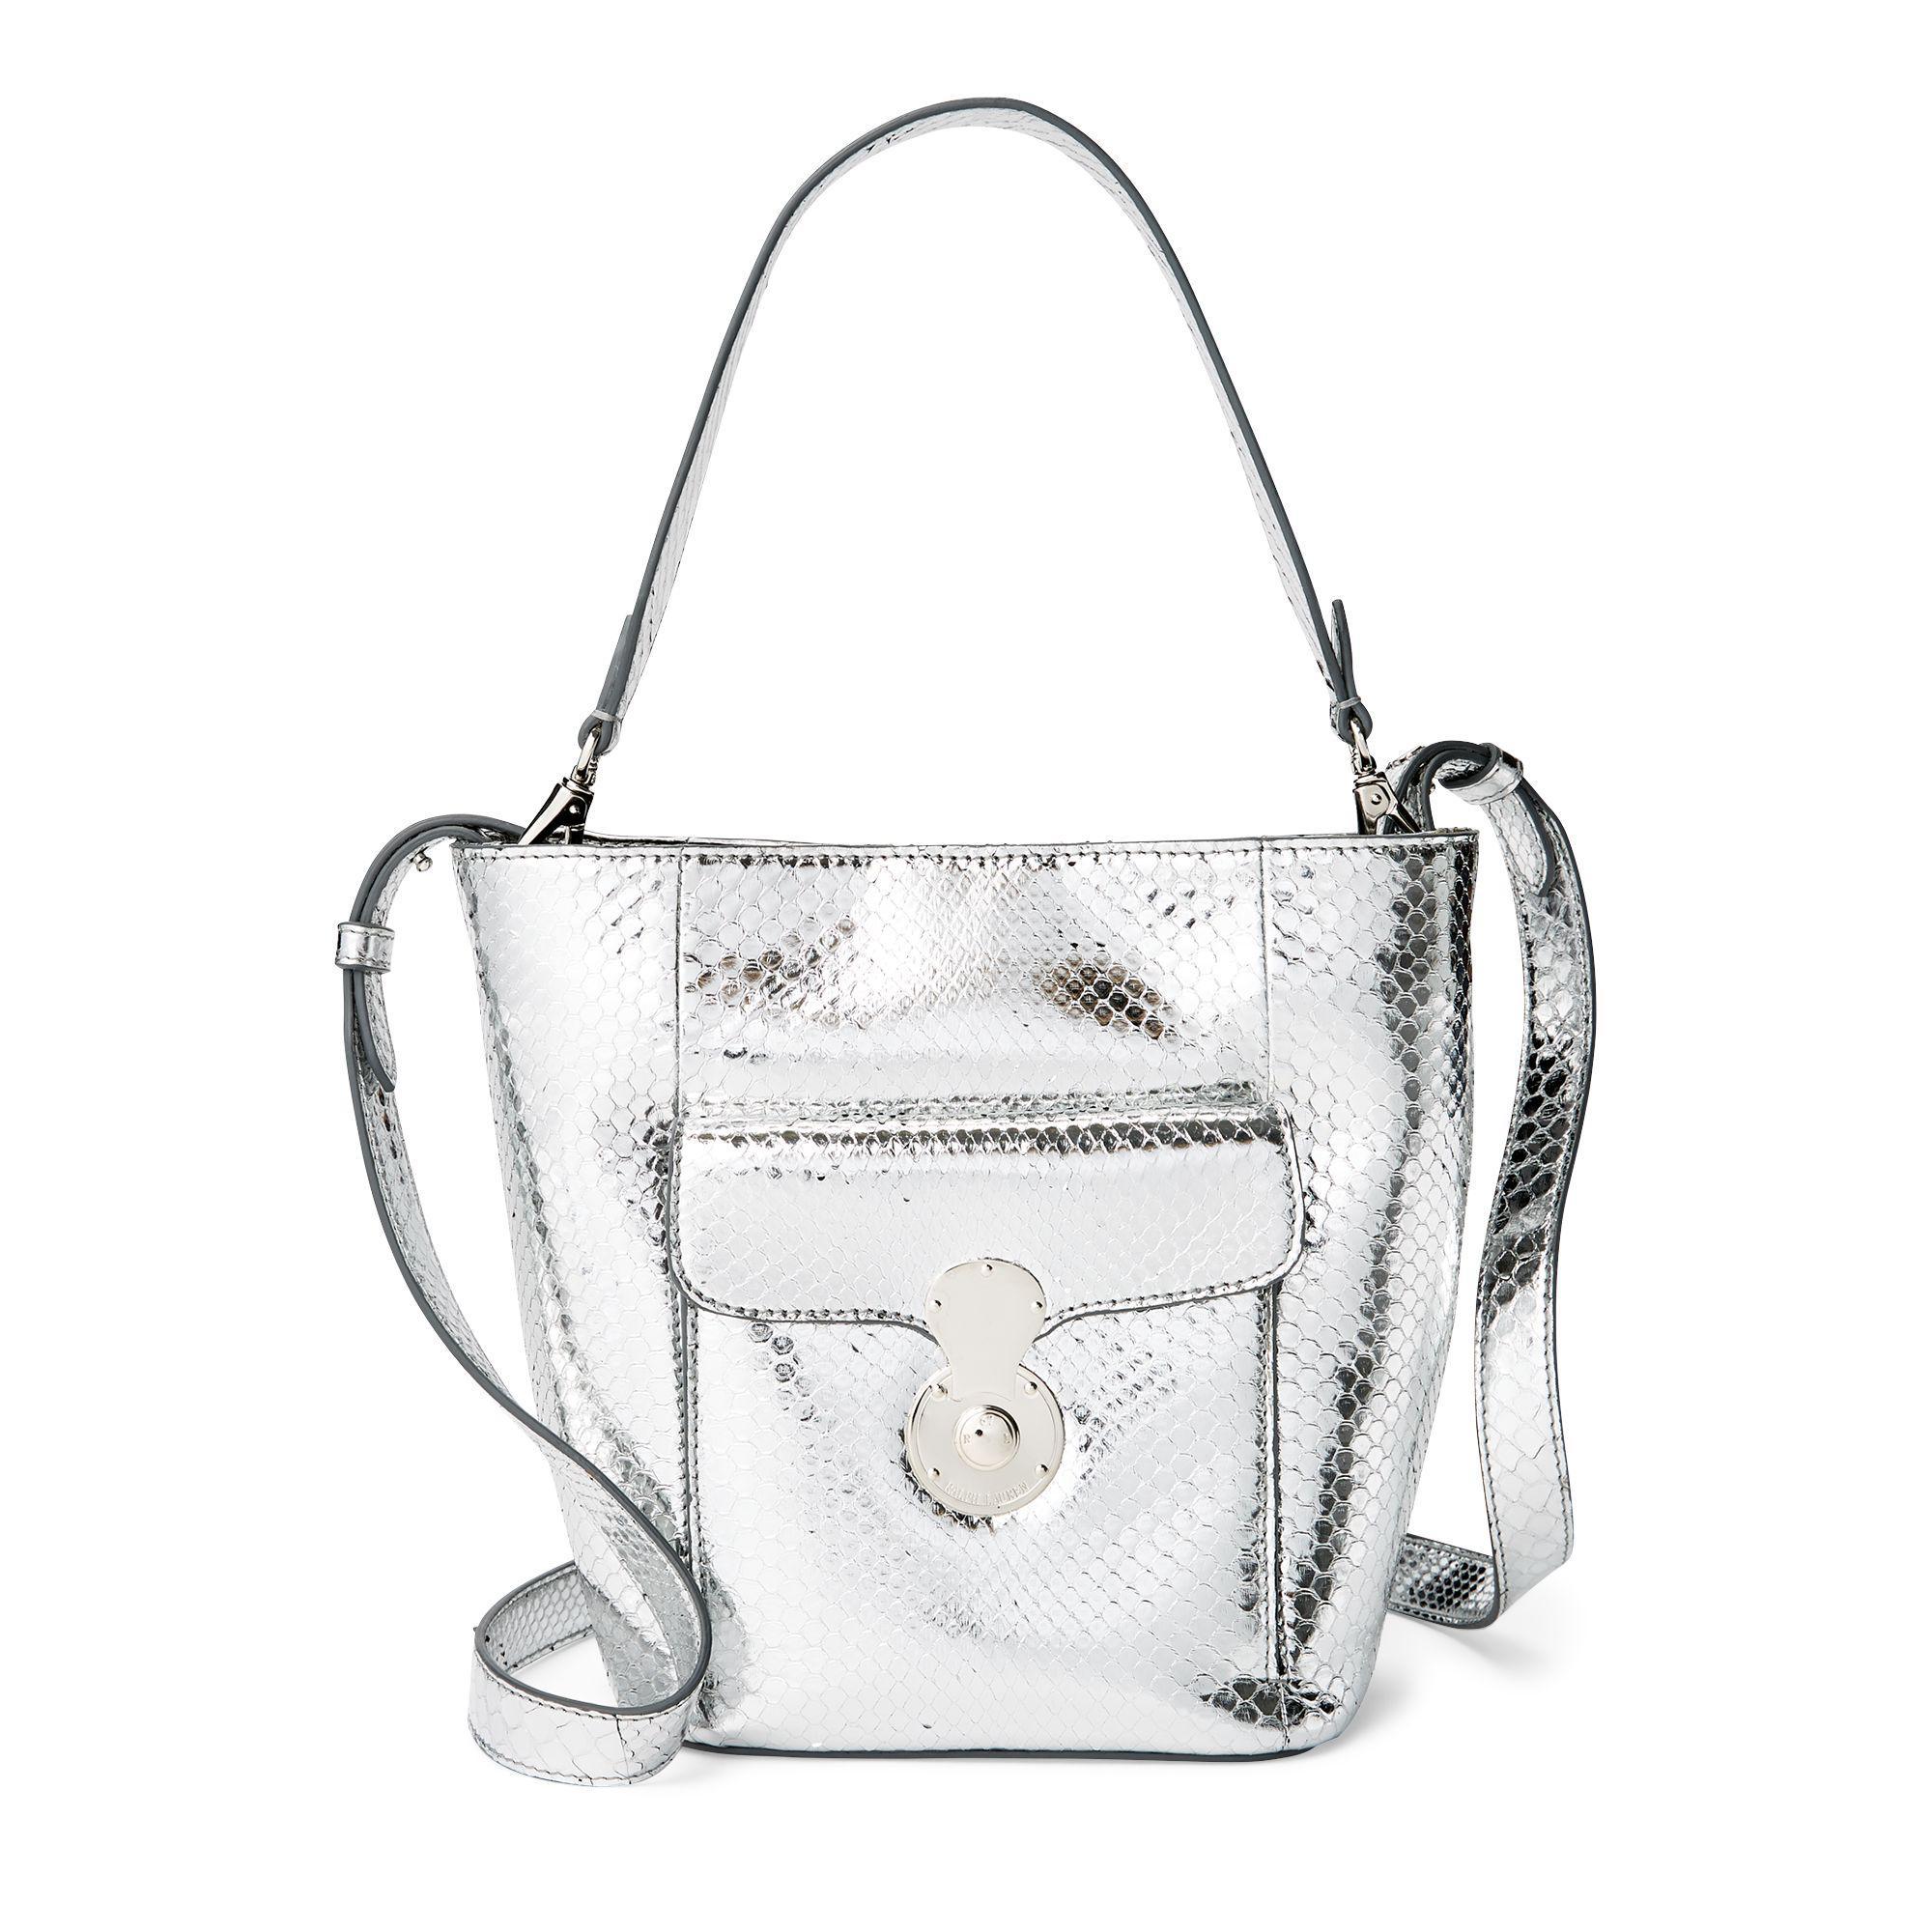 Ralph Lauren Python Mini Rl Bucket Bag in Metallic - Lyst 8a01f76bf5